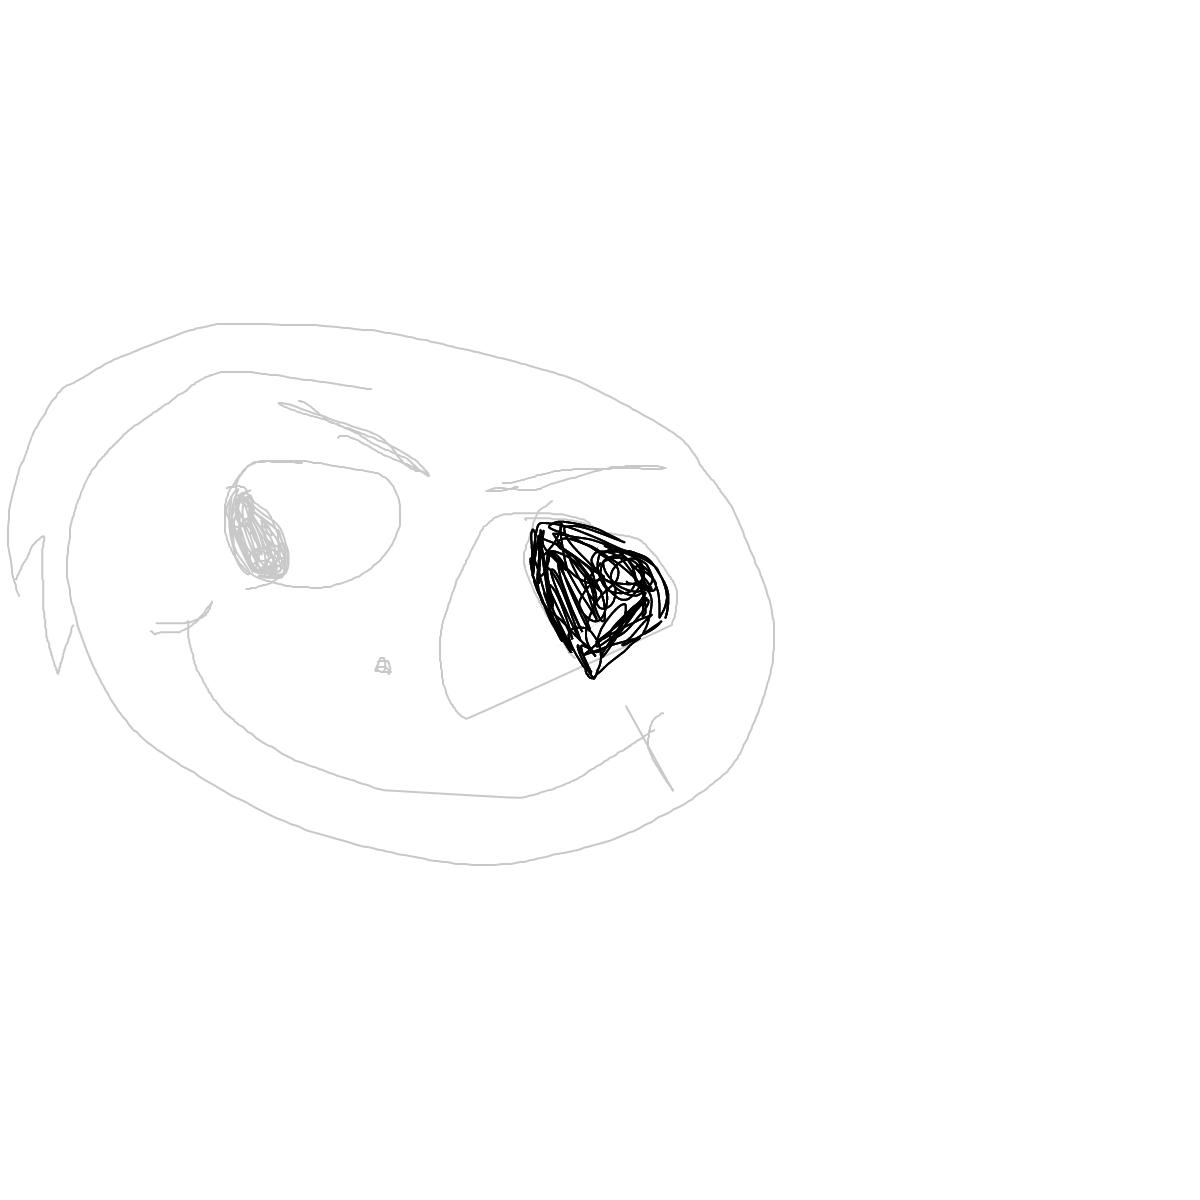 BAAAM drawing#2671 lat:63.5731658935546900lng: 37.9268150329589840